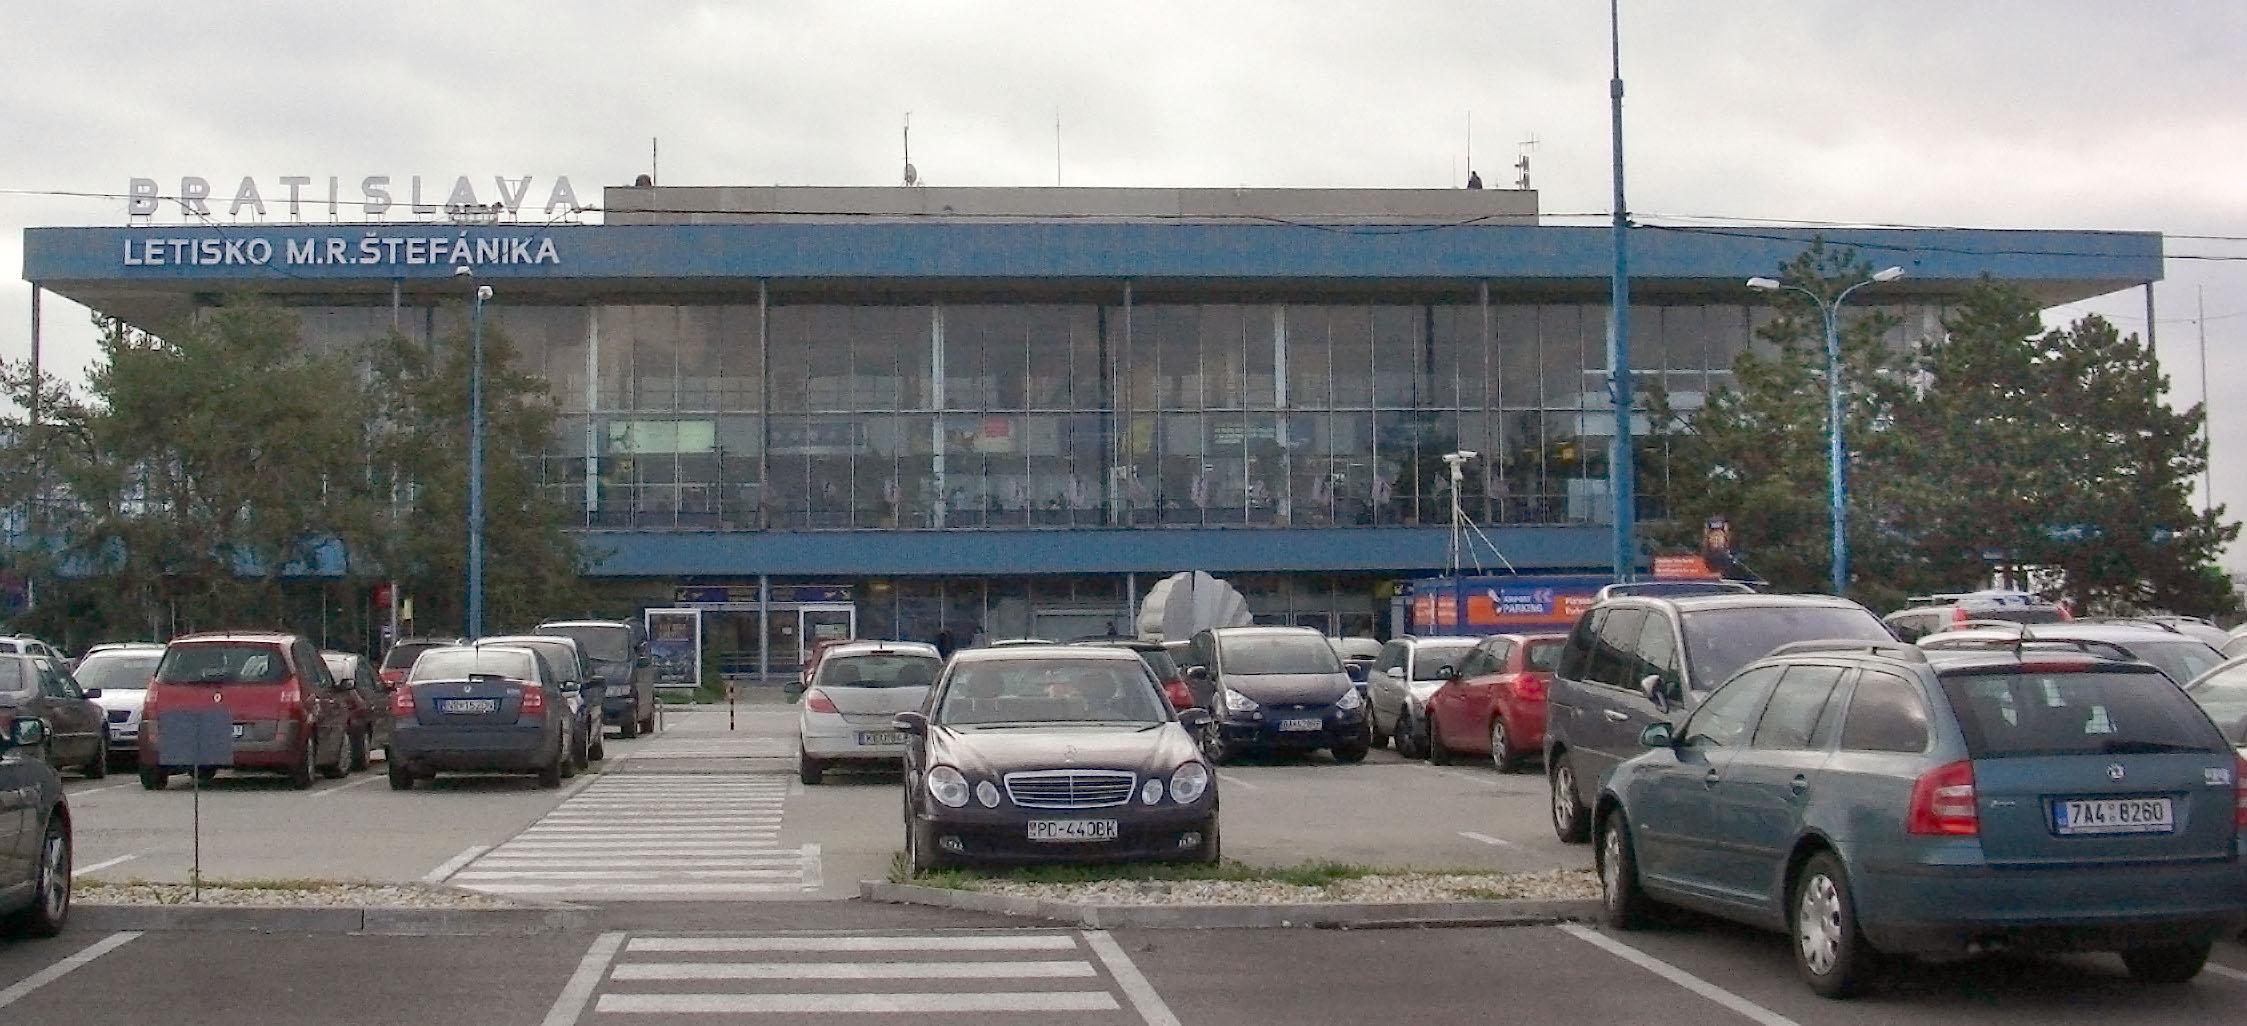 bratislava-airport